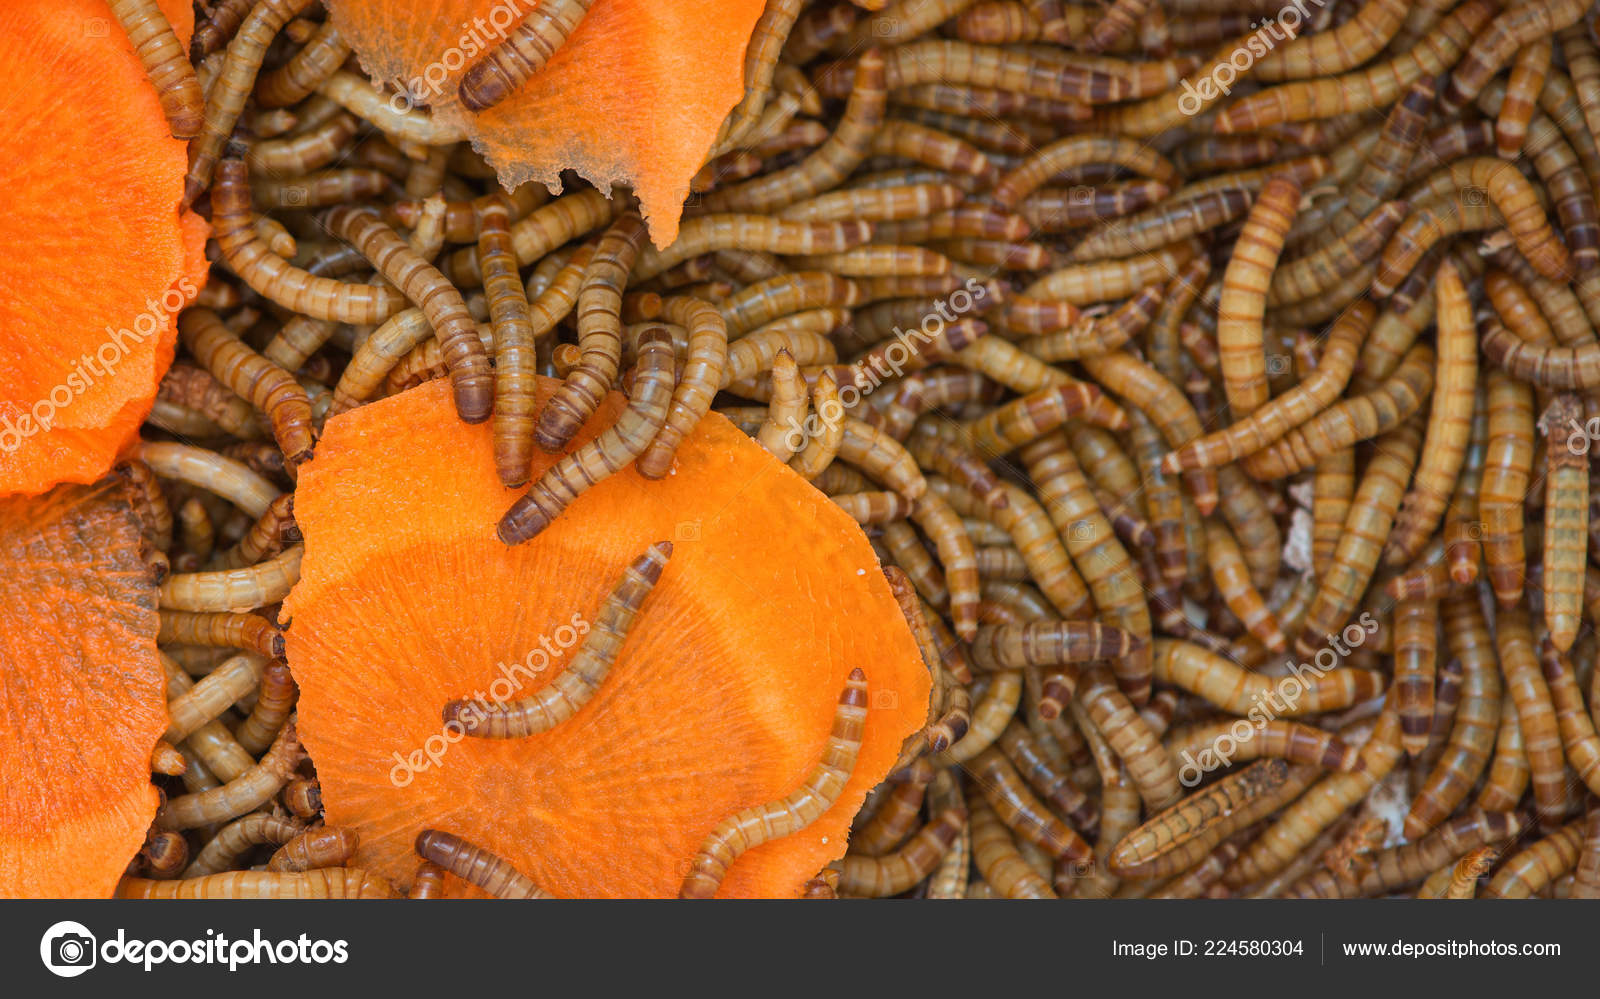 червячки в моркови